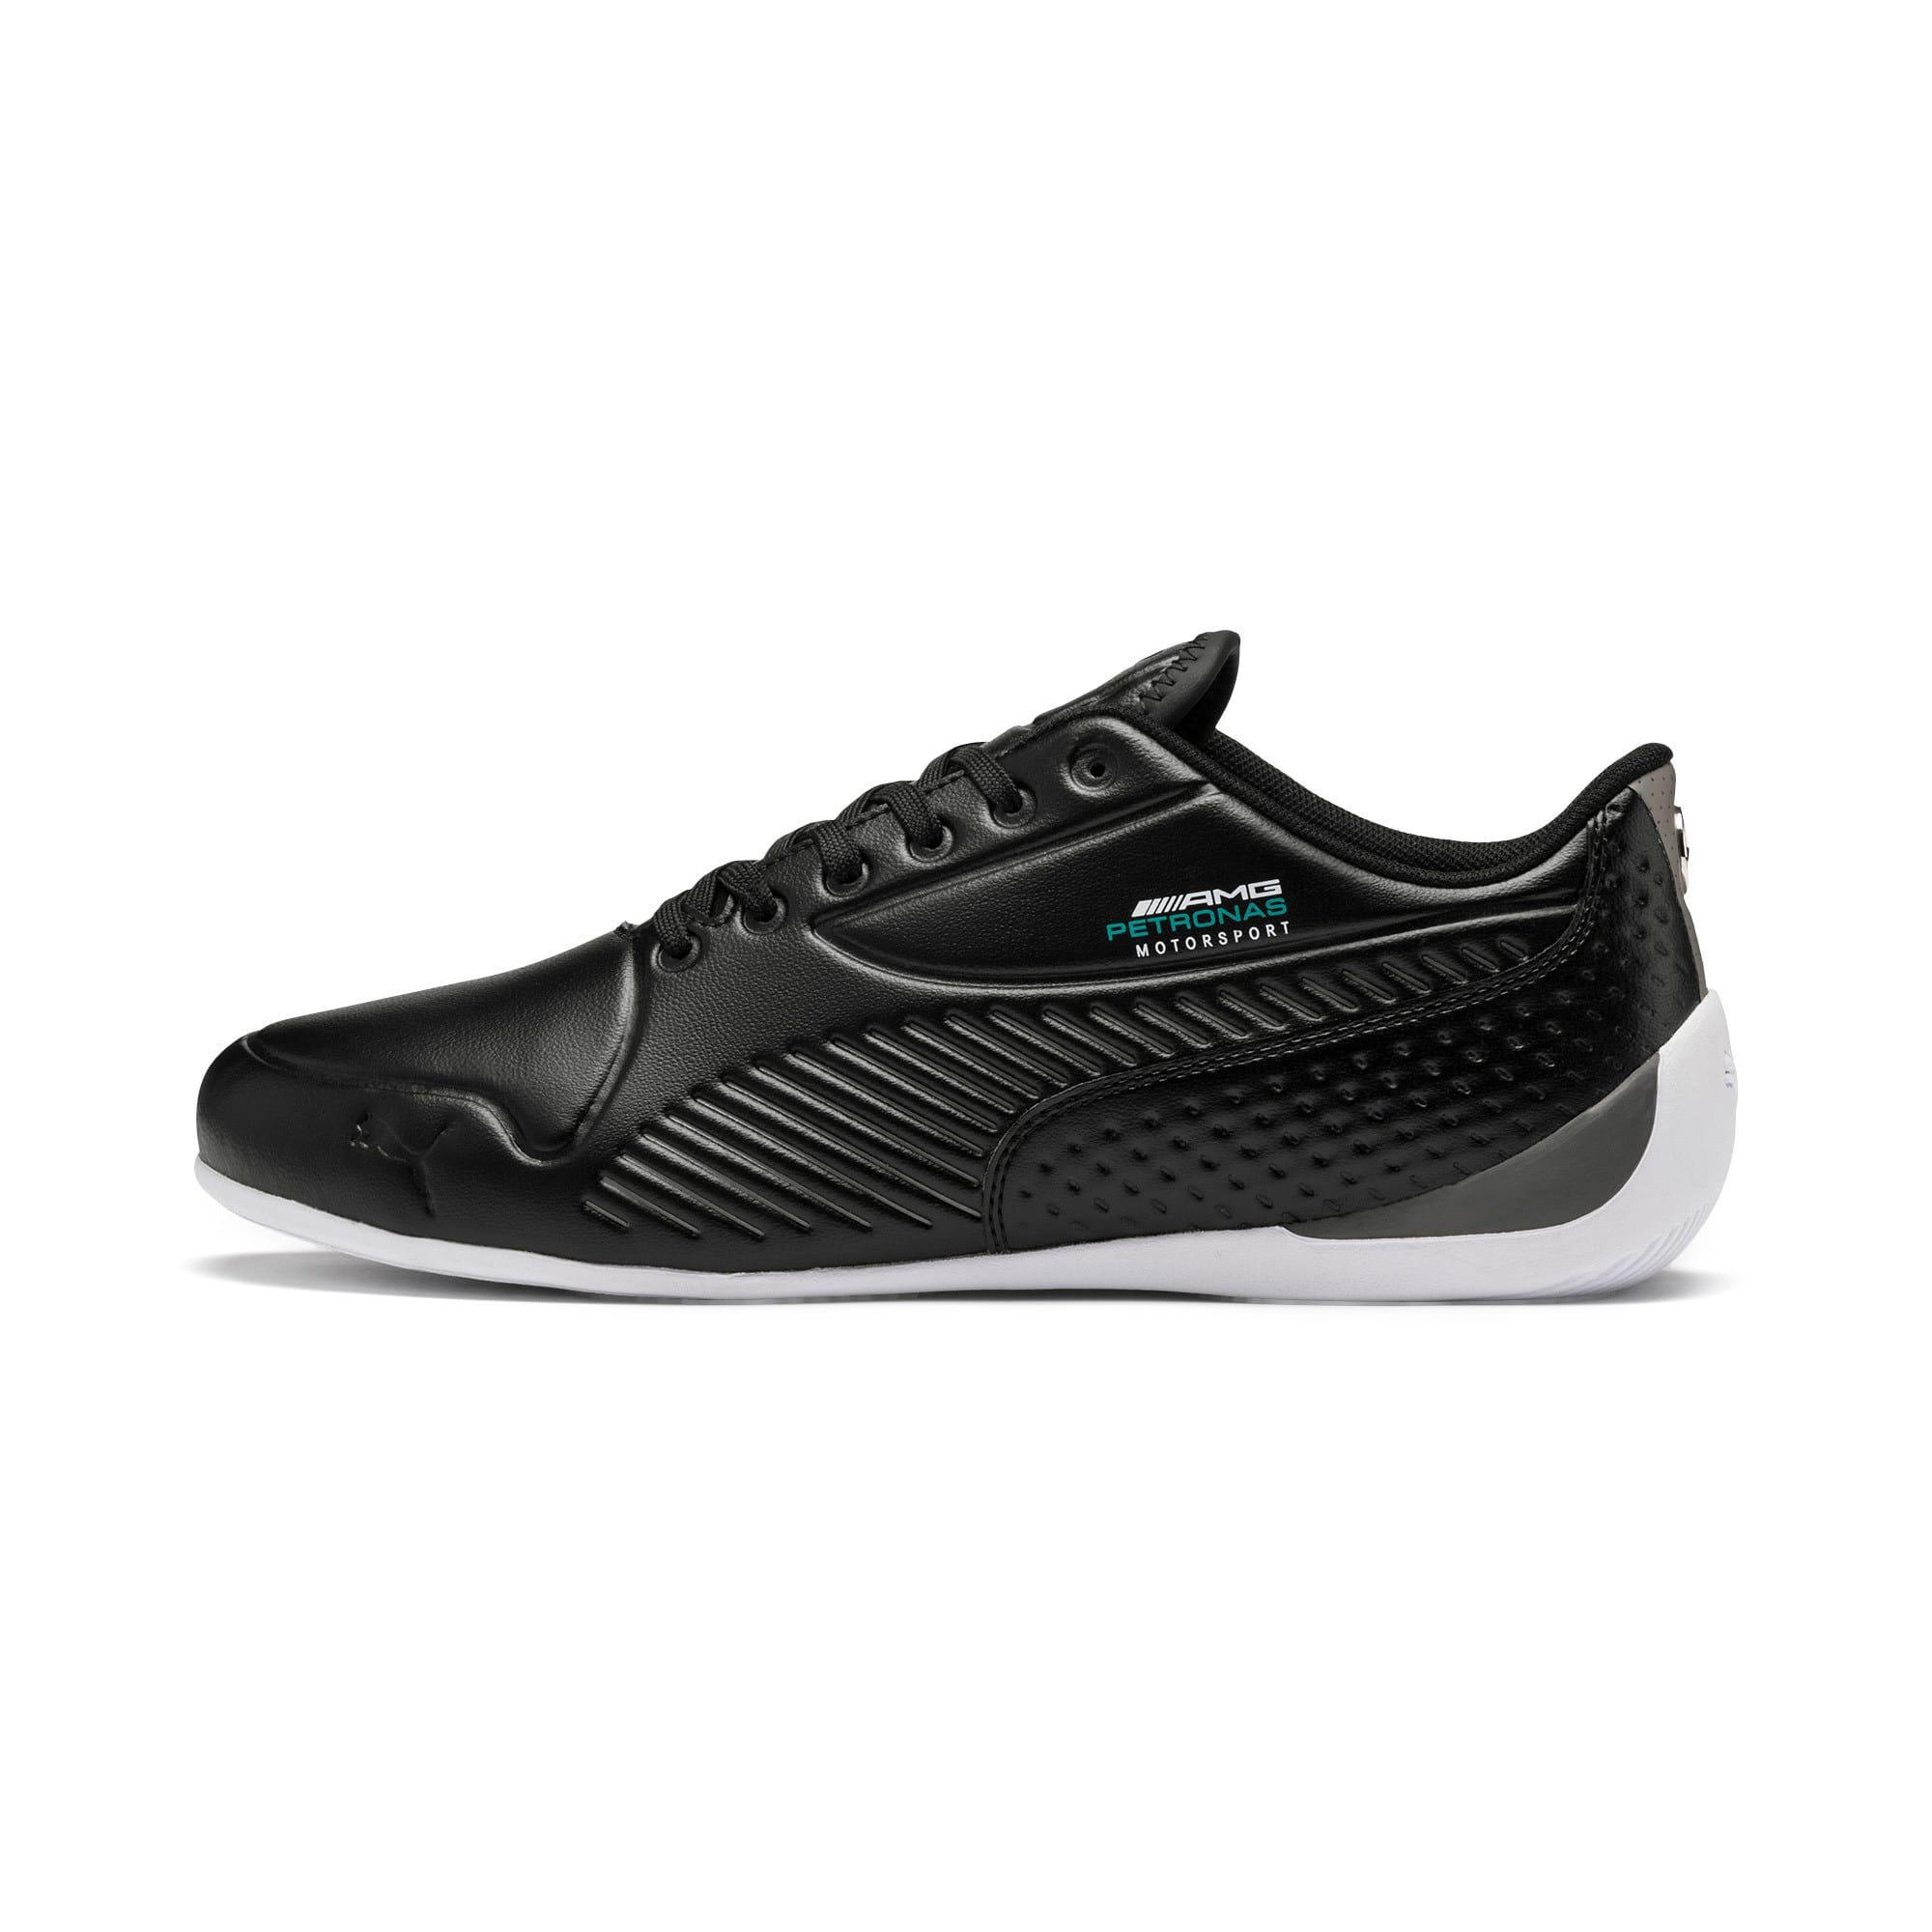 Thumbnail 1 of Mercedes AMG Petronas Drift Cat 7S Ultra Men's Shoes, Puma Black-Puma Black, medium